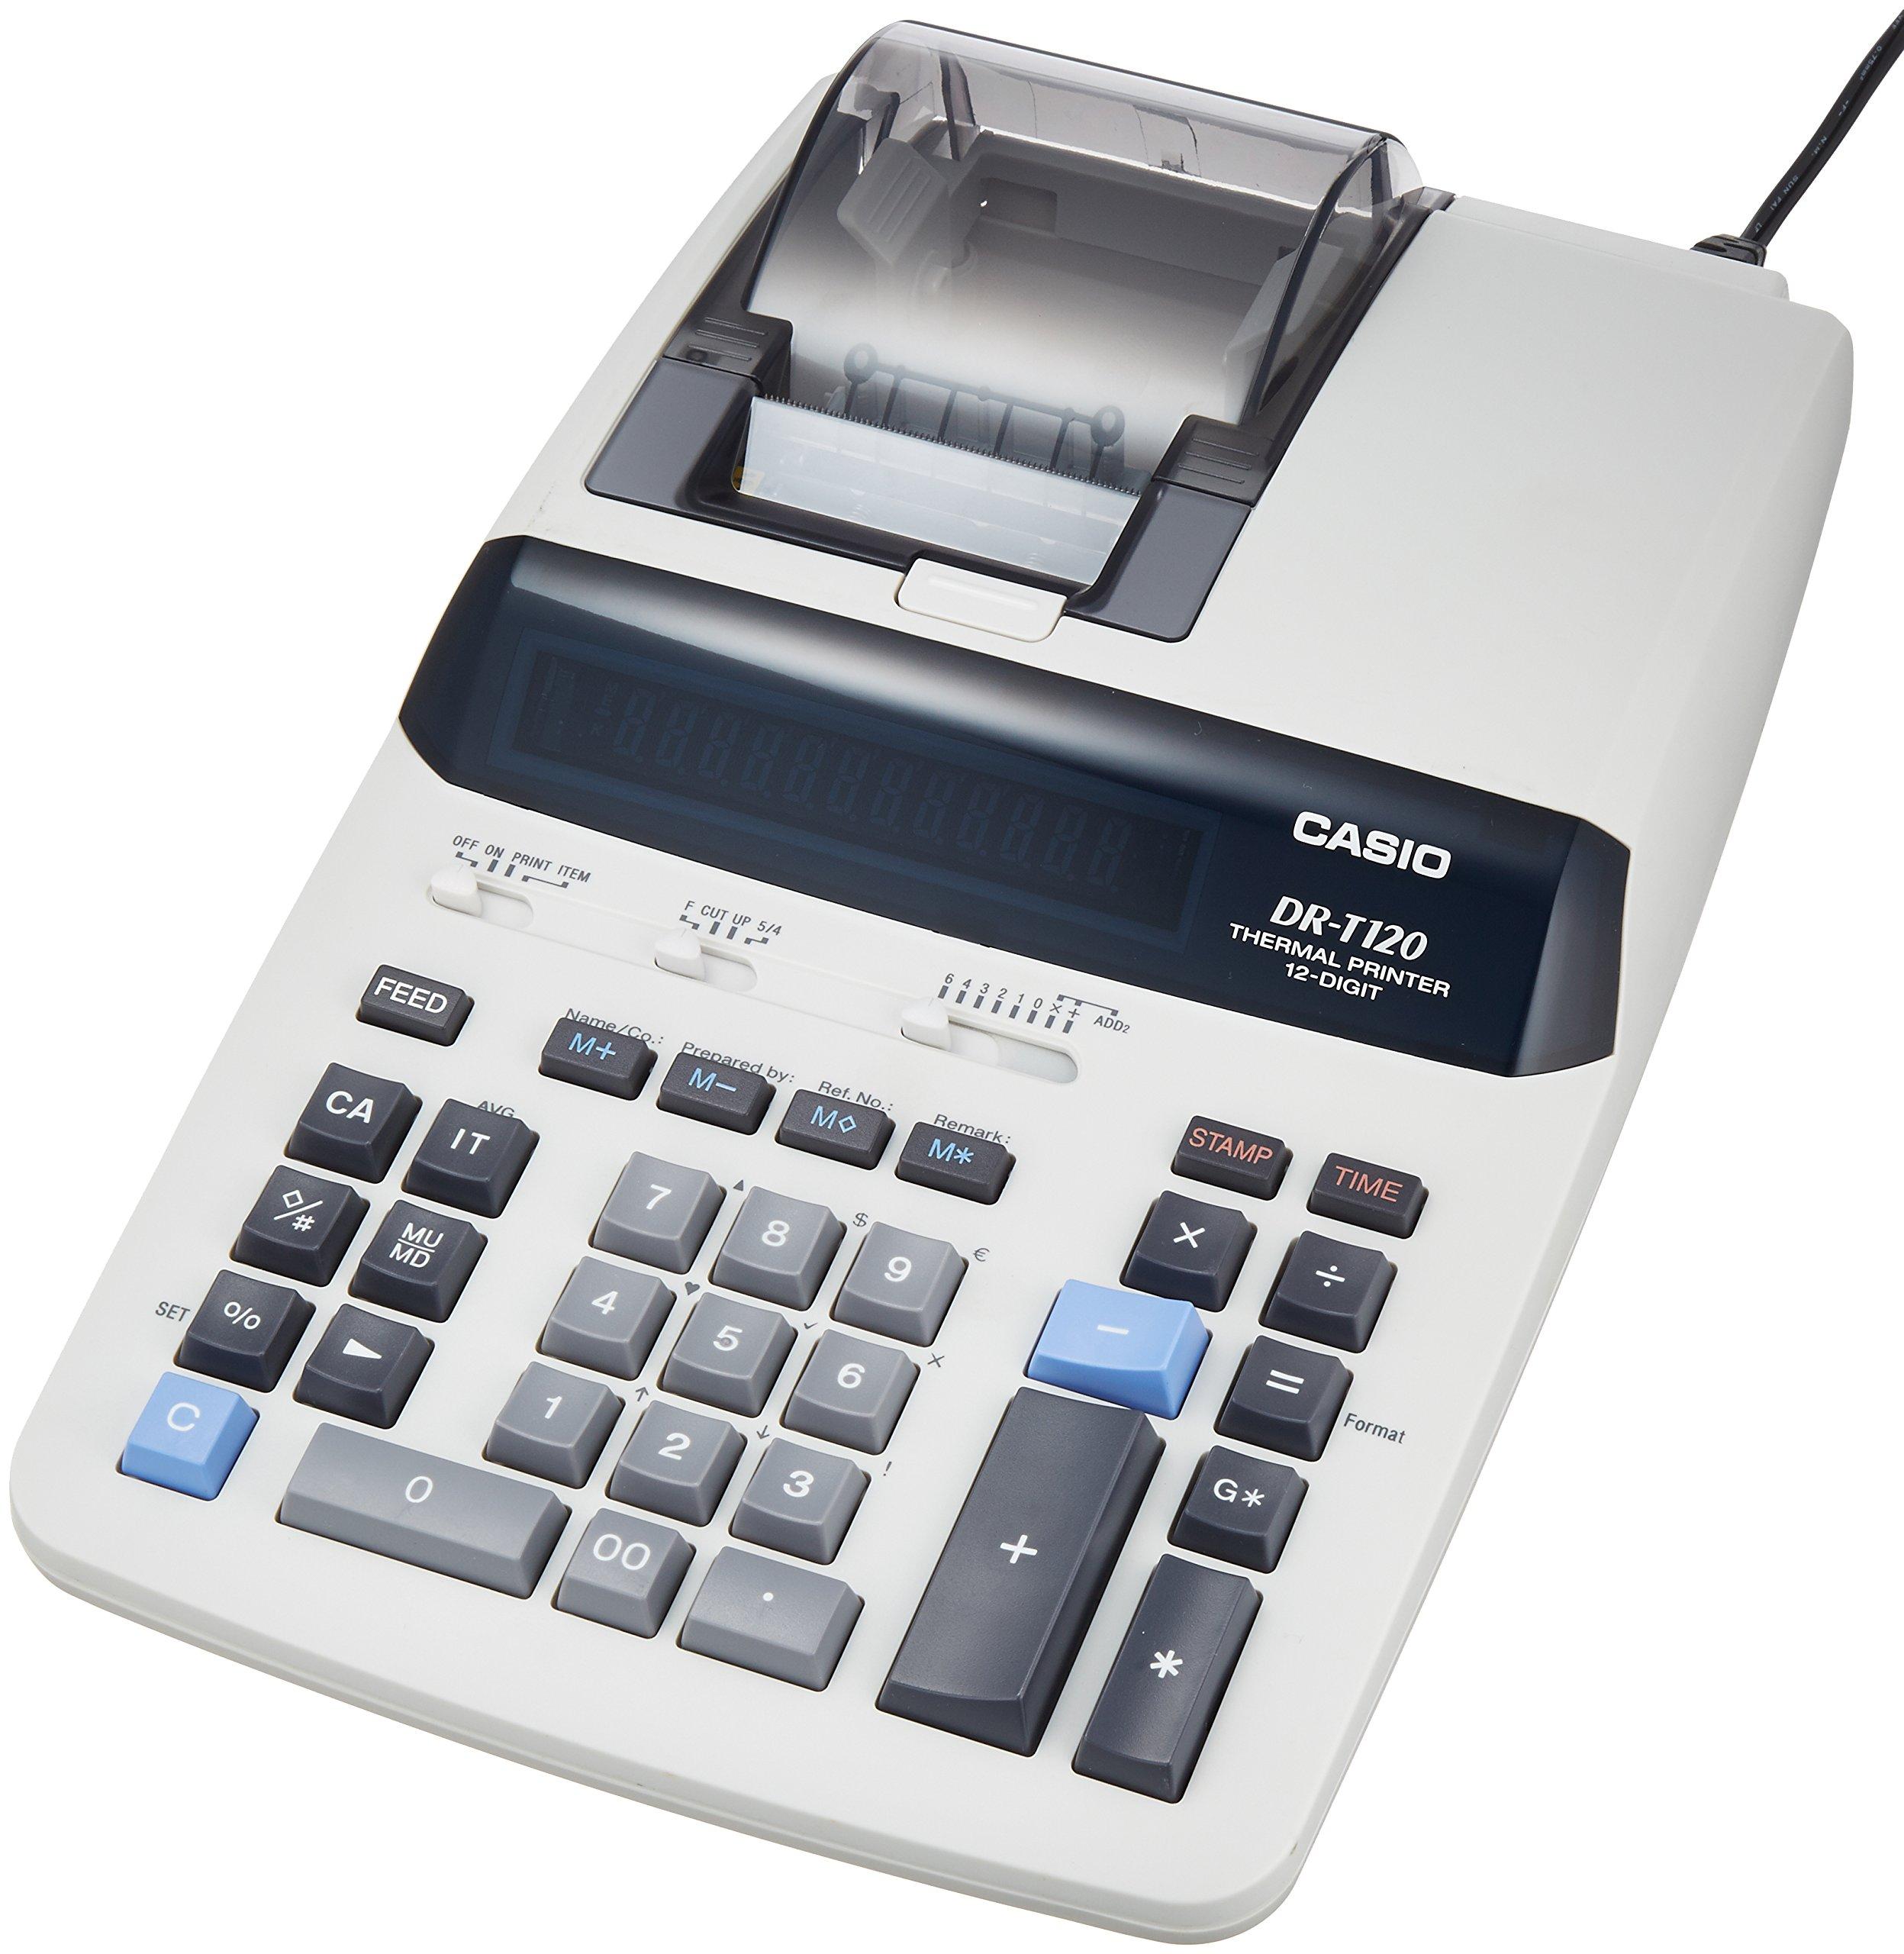 Casio printer calculator desk type 12-digit DR-T120-WE by Casio